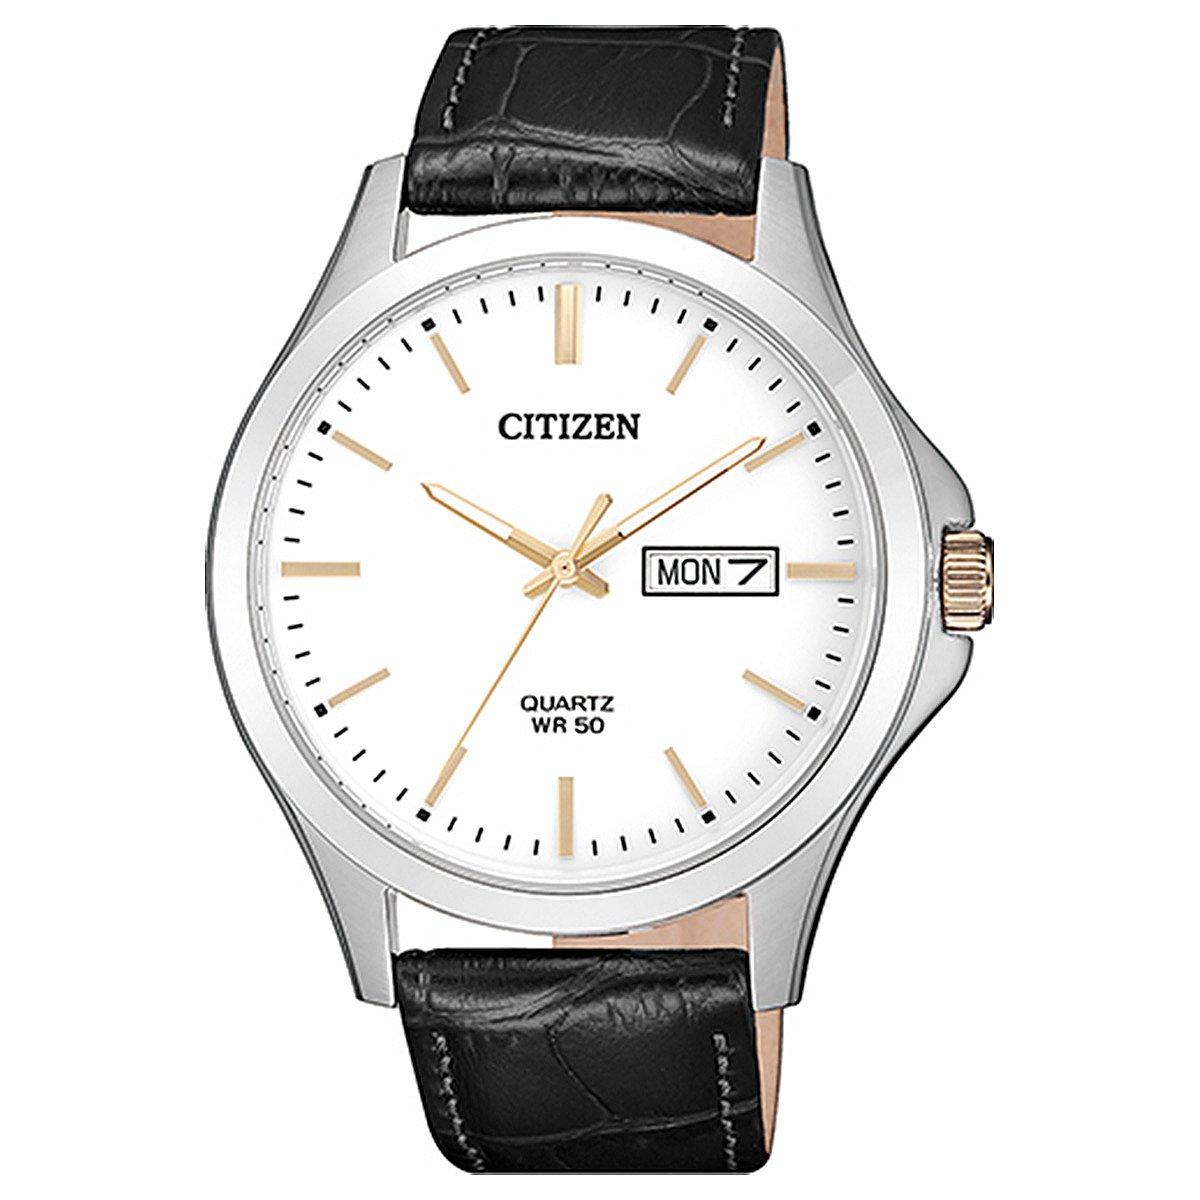 30878676a64 Relógio Citizen Analógico TZ20822B Masculino